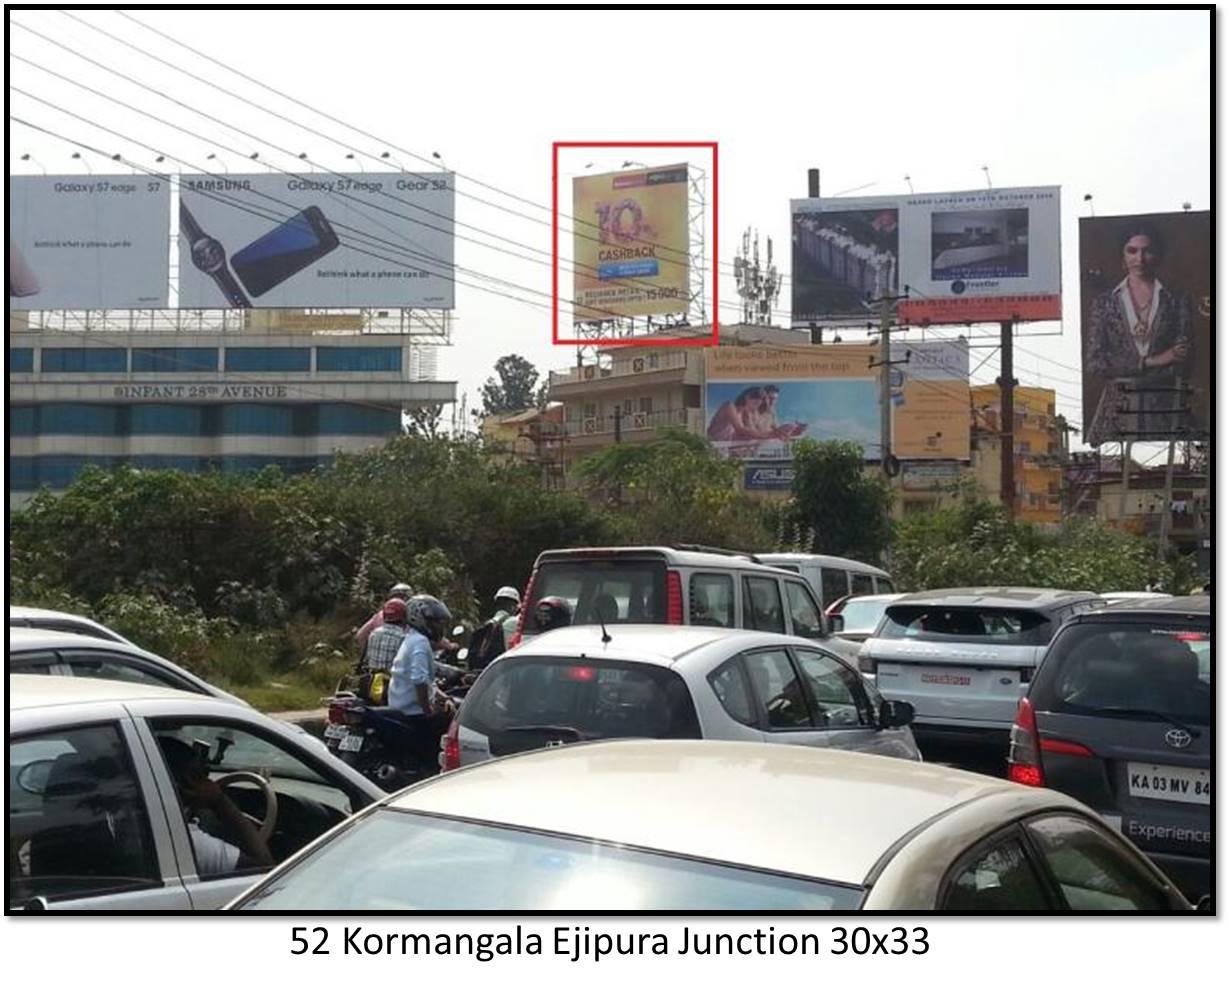 Kormangala Ejipura Junction, Bengaluru